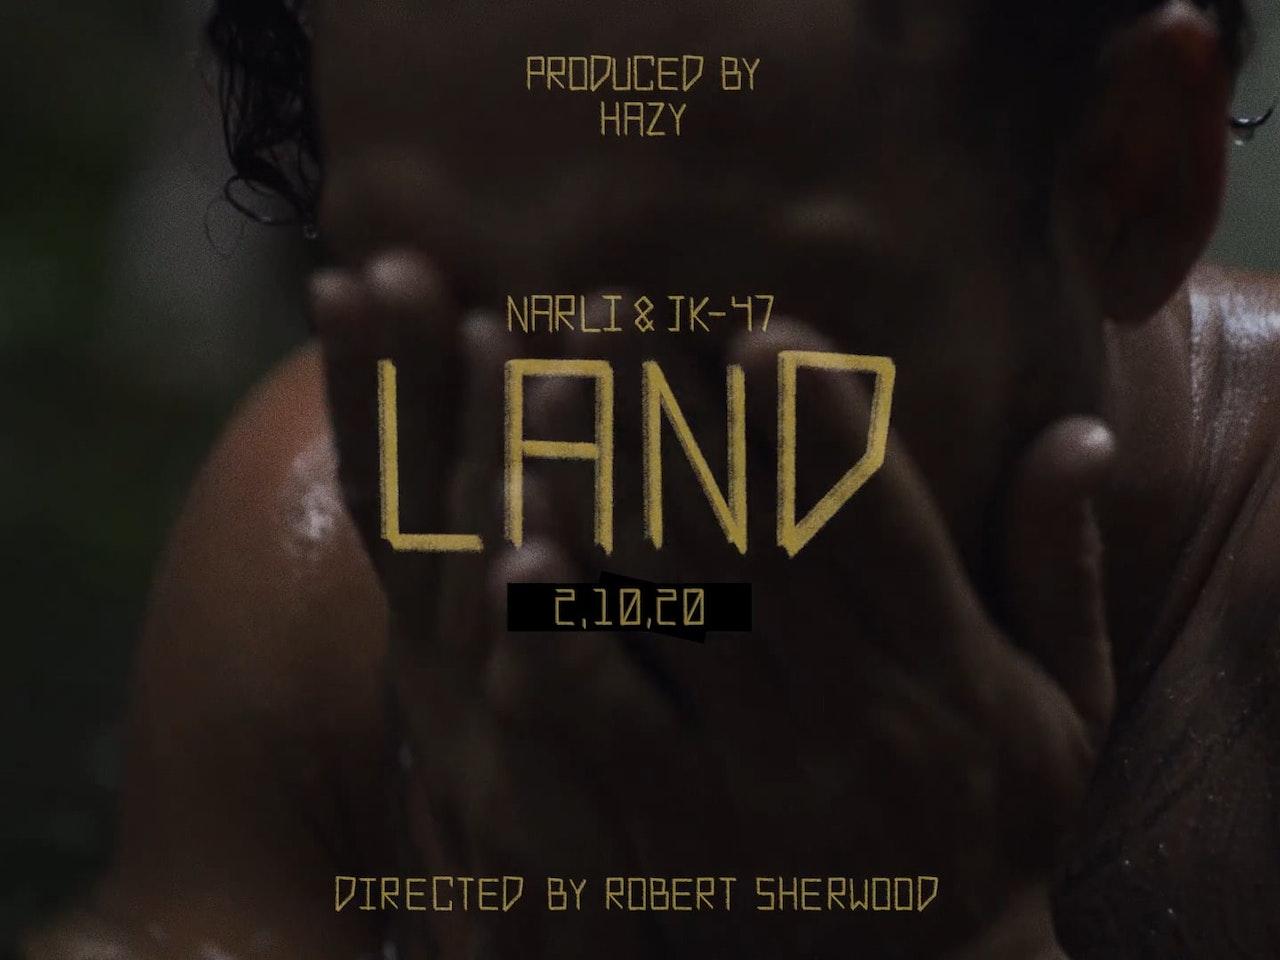 Narli & JK-47 'LAND' trailer